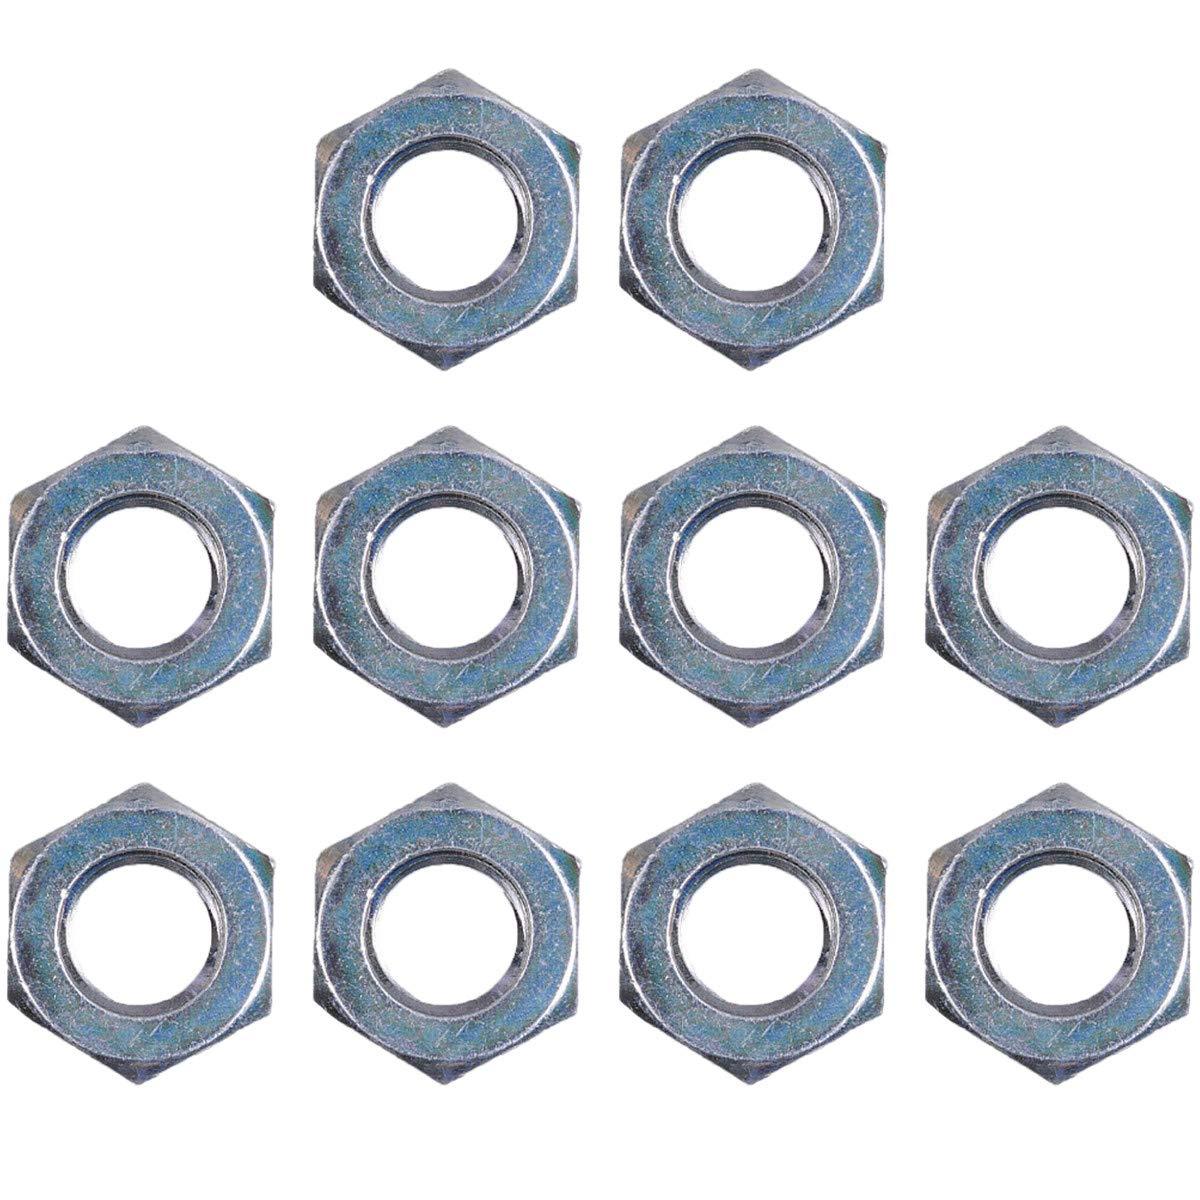 10 Pack Genuine Echo/Shindaiwa 90051300010 Nut 10X1.25 LH Fits PE-200 PE-225 PE-230 PE-260 PE-280 PE-310 Trimmers Edgers